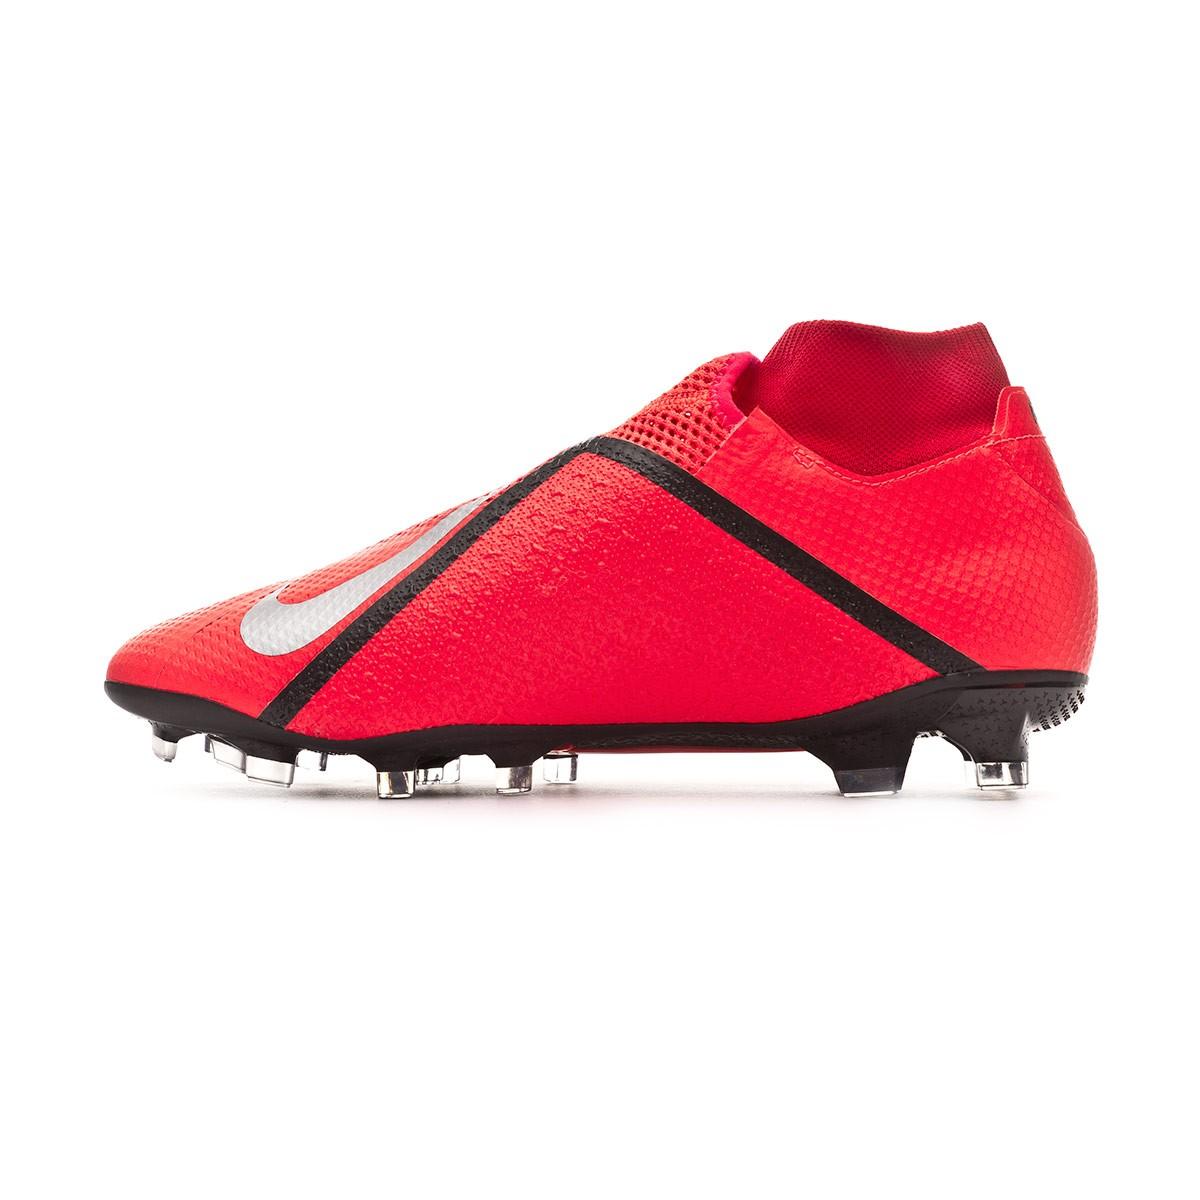 146705389 Football Boots Nike Phantom Vision Pro DF FG Bright crimson-Metallic silver  - Football store Fútbol Emotion